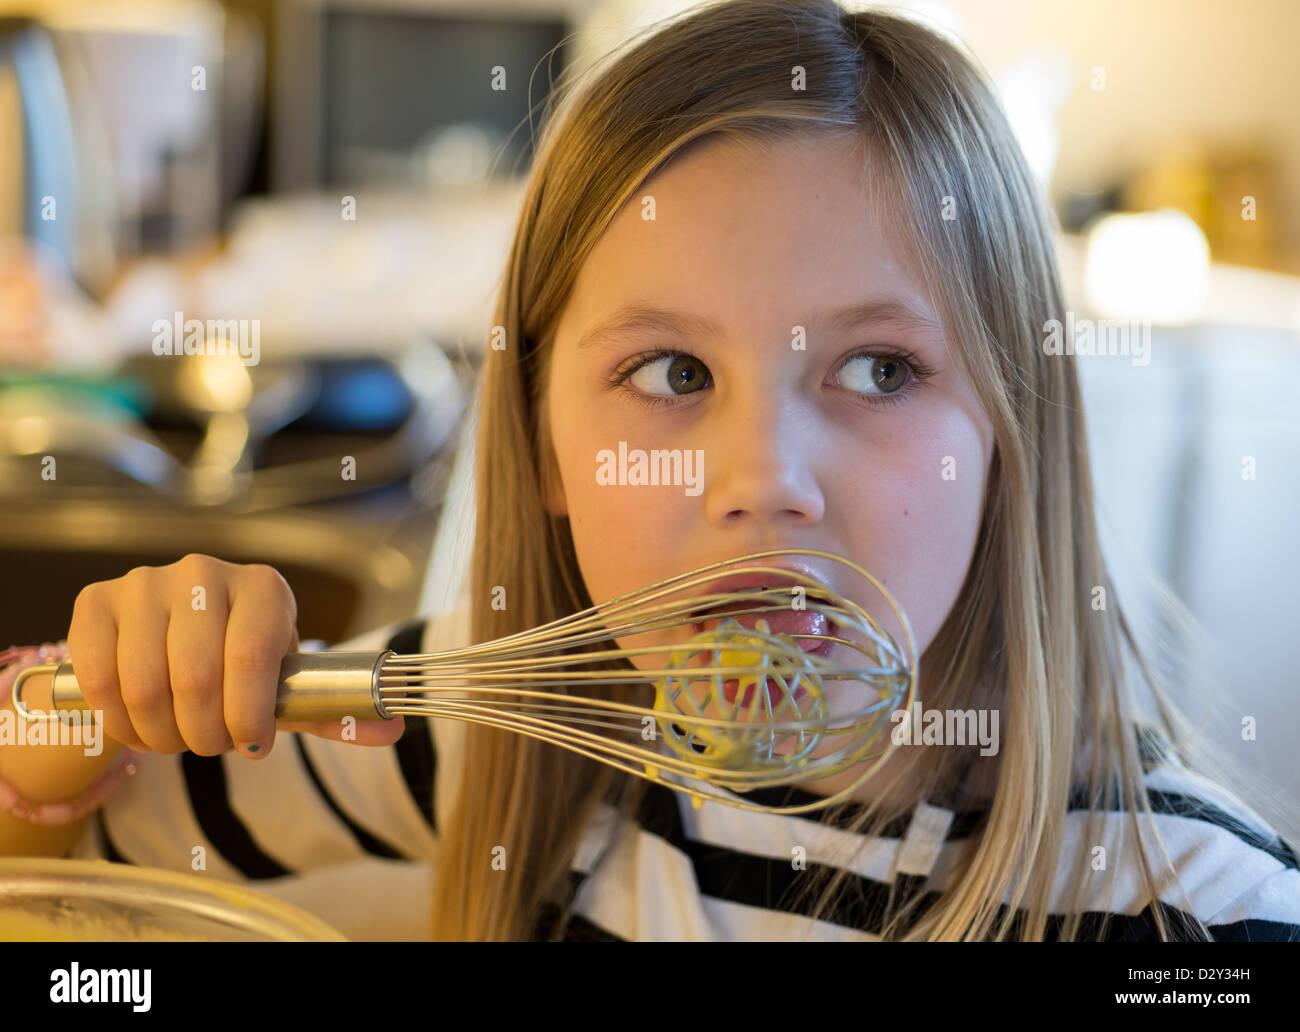 Porn vagina girls licking food of cocks women